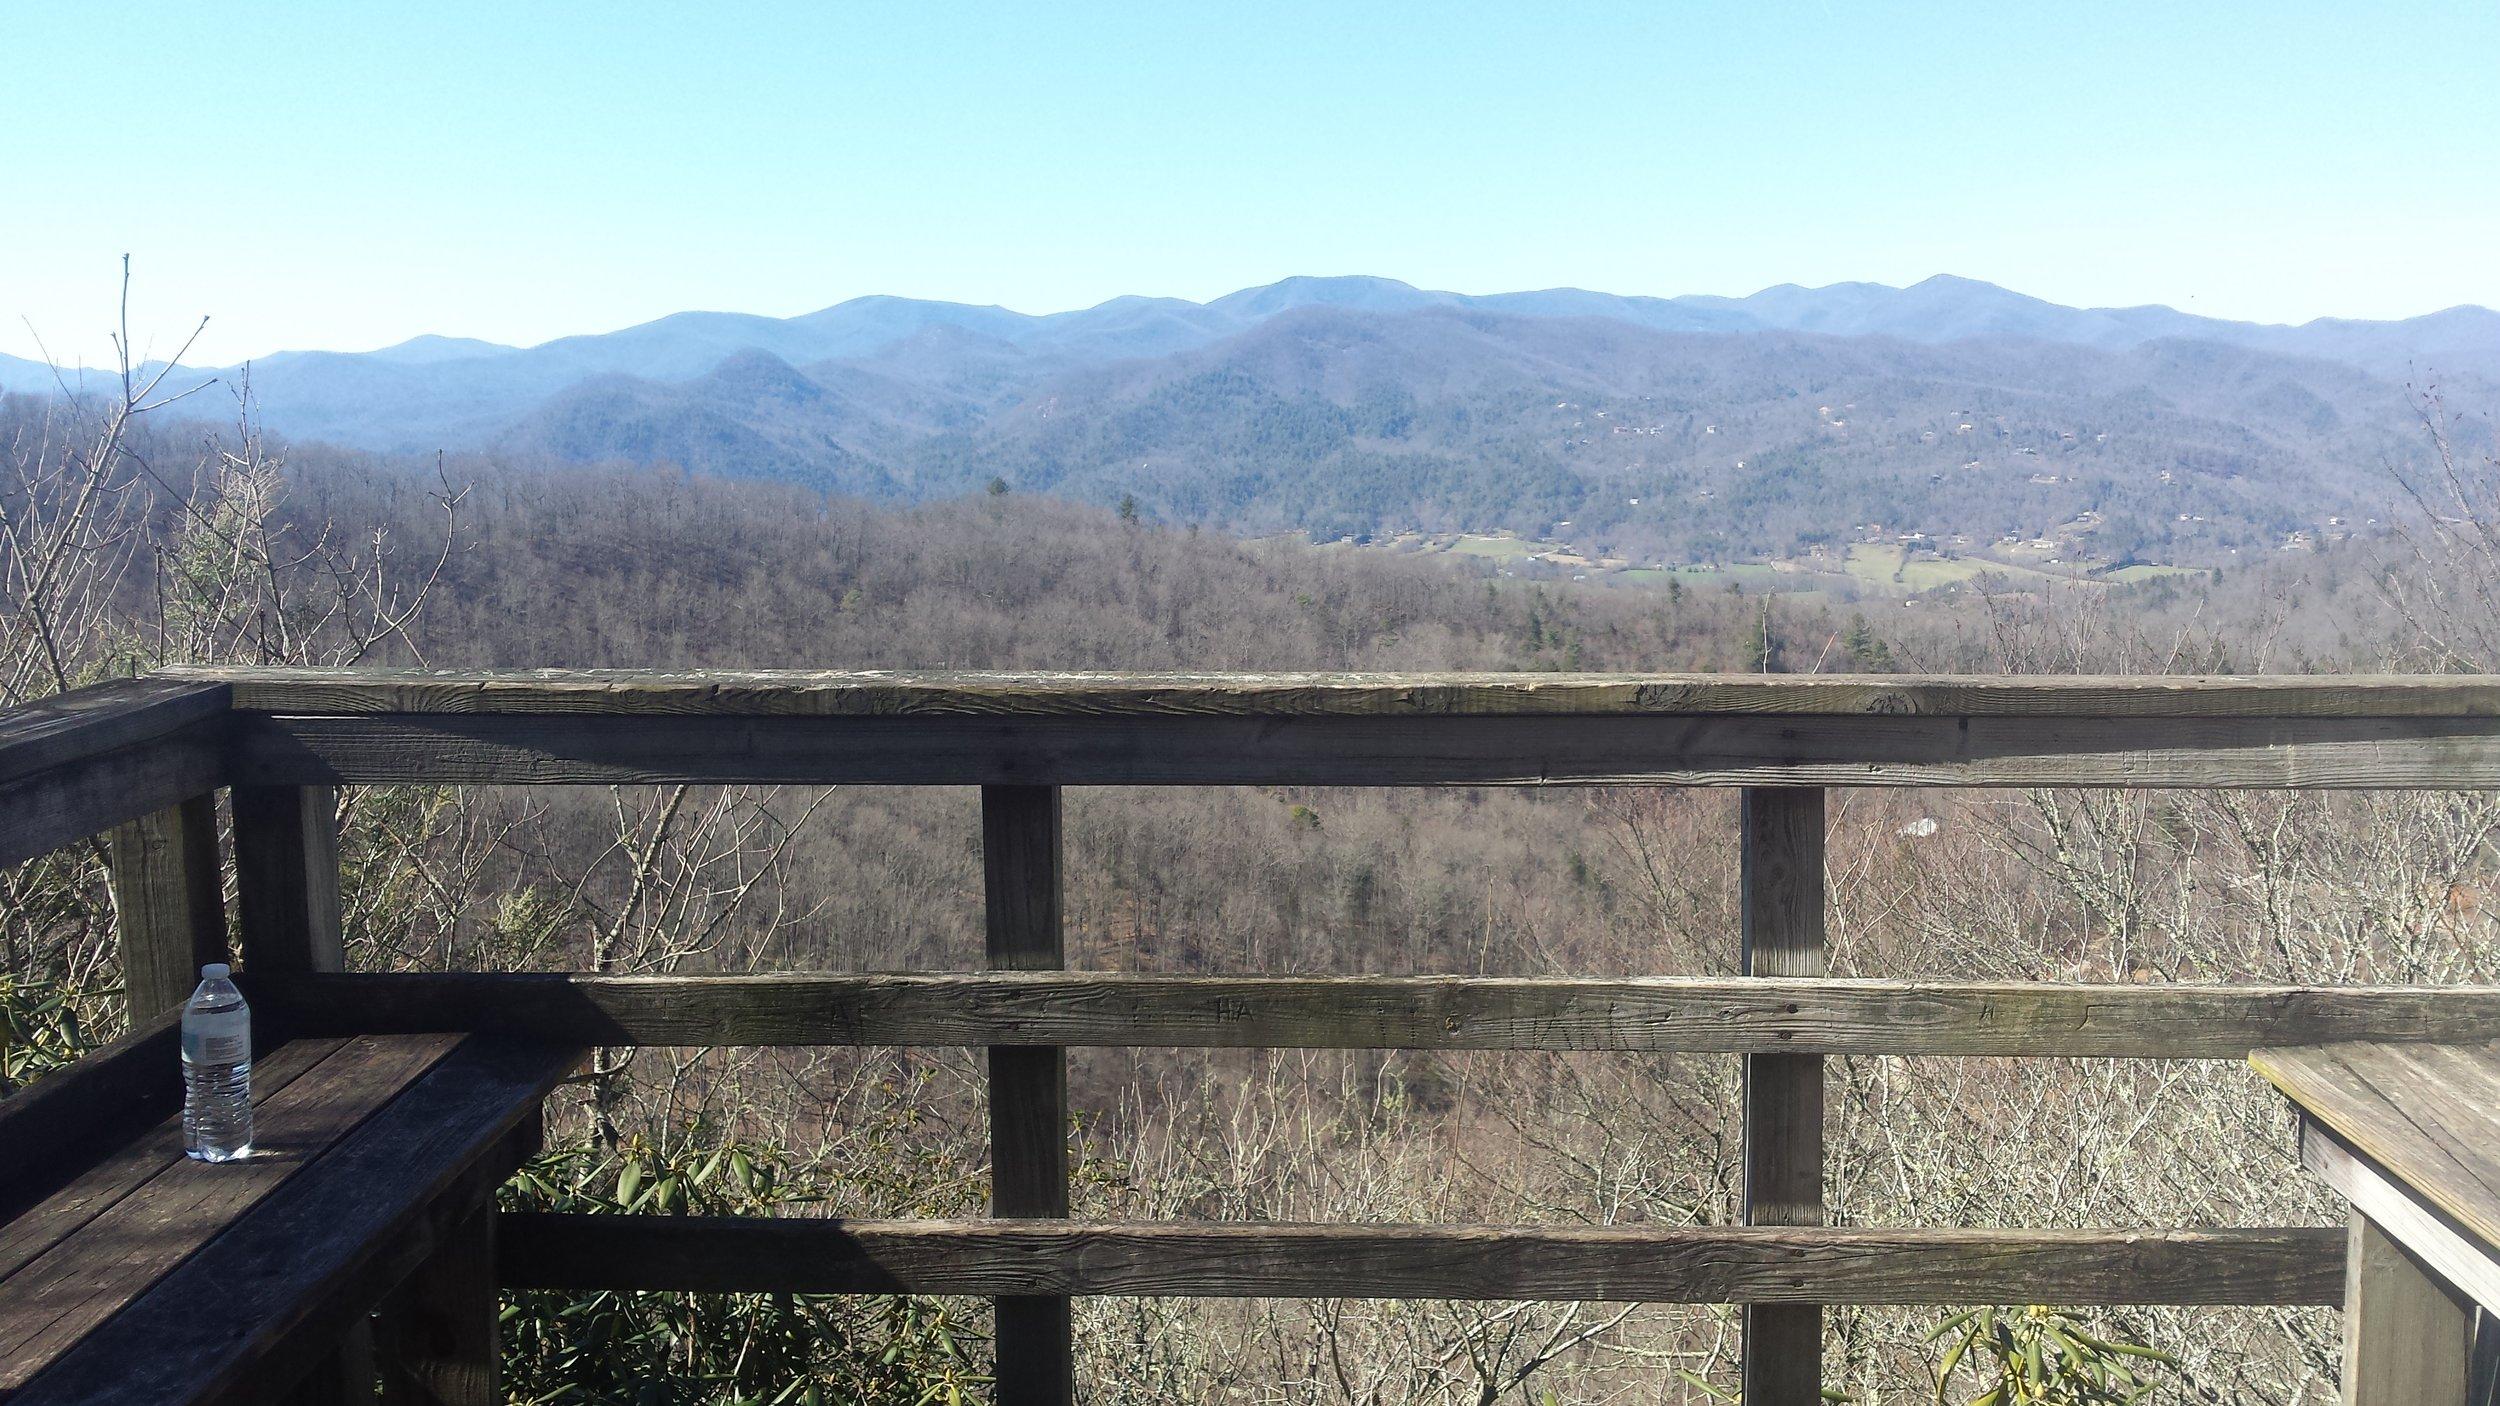 Overlook at Black Rock Mountain